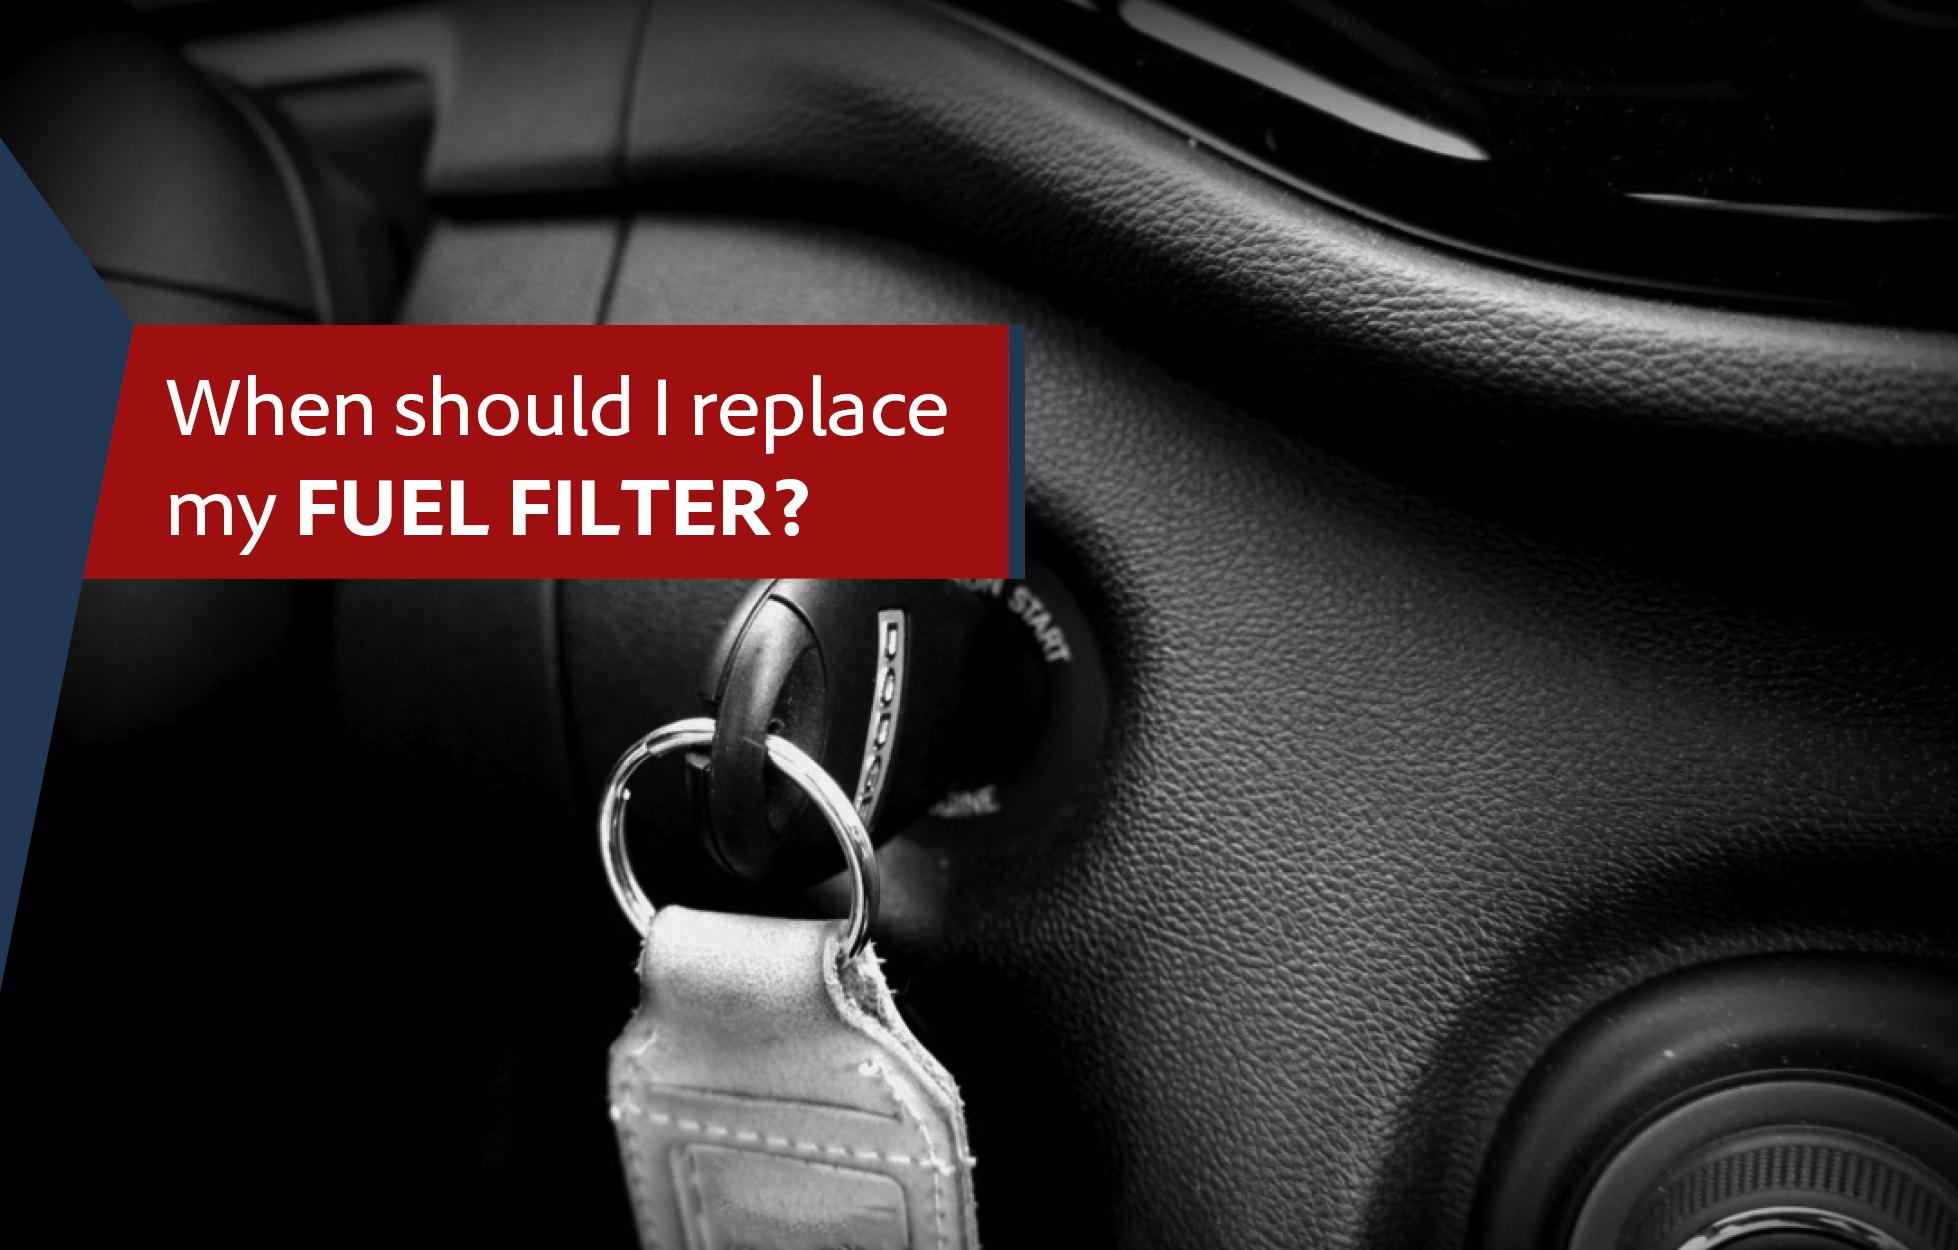 Greystone Tire and Auto FAQ Fuel Filter.jpg